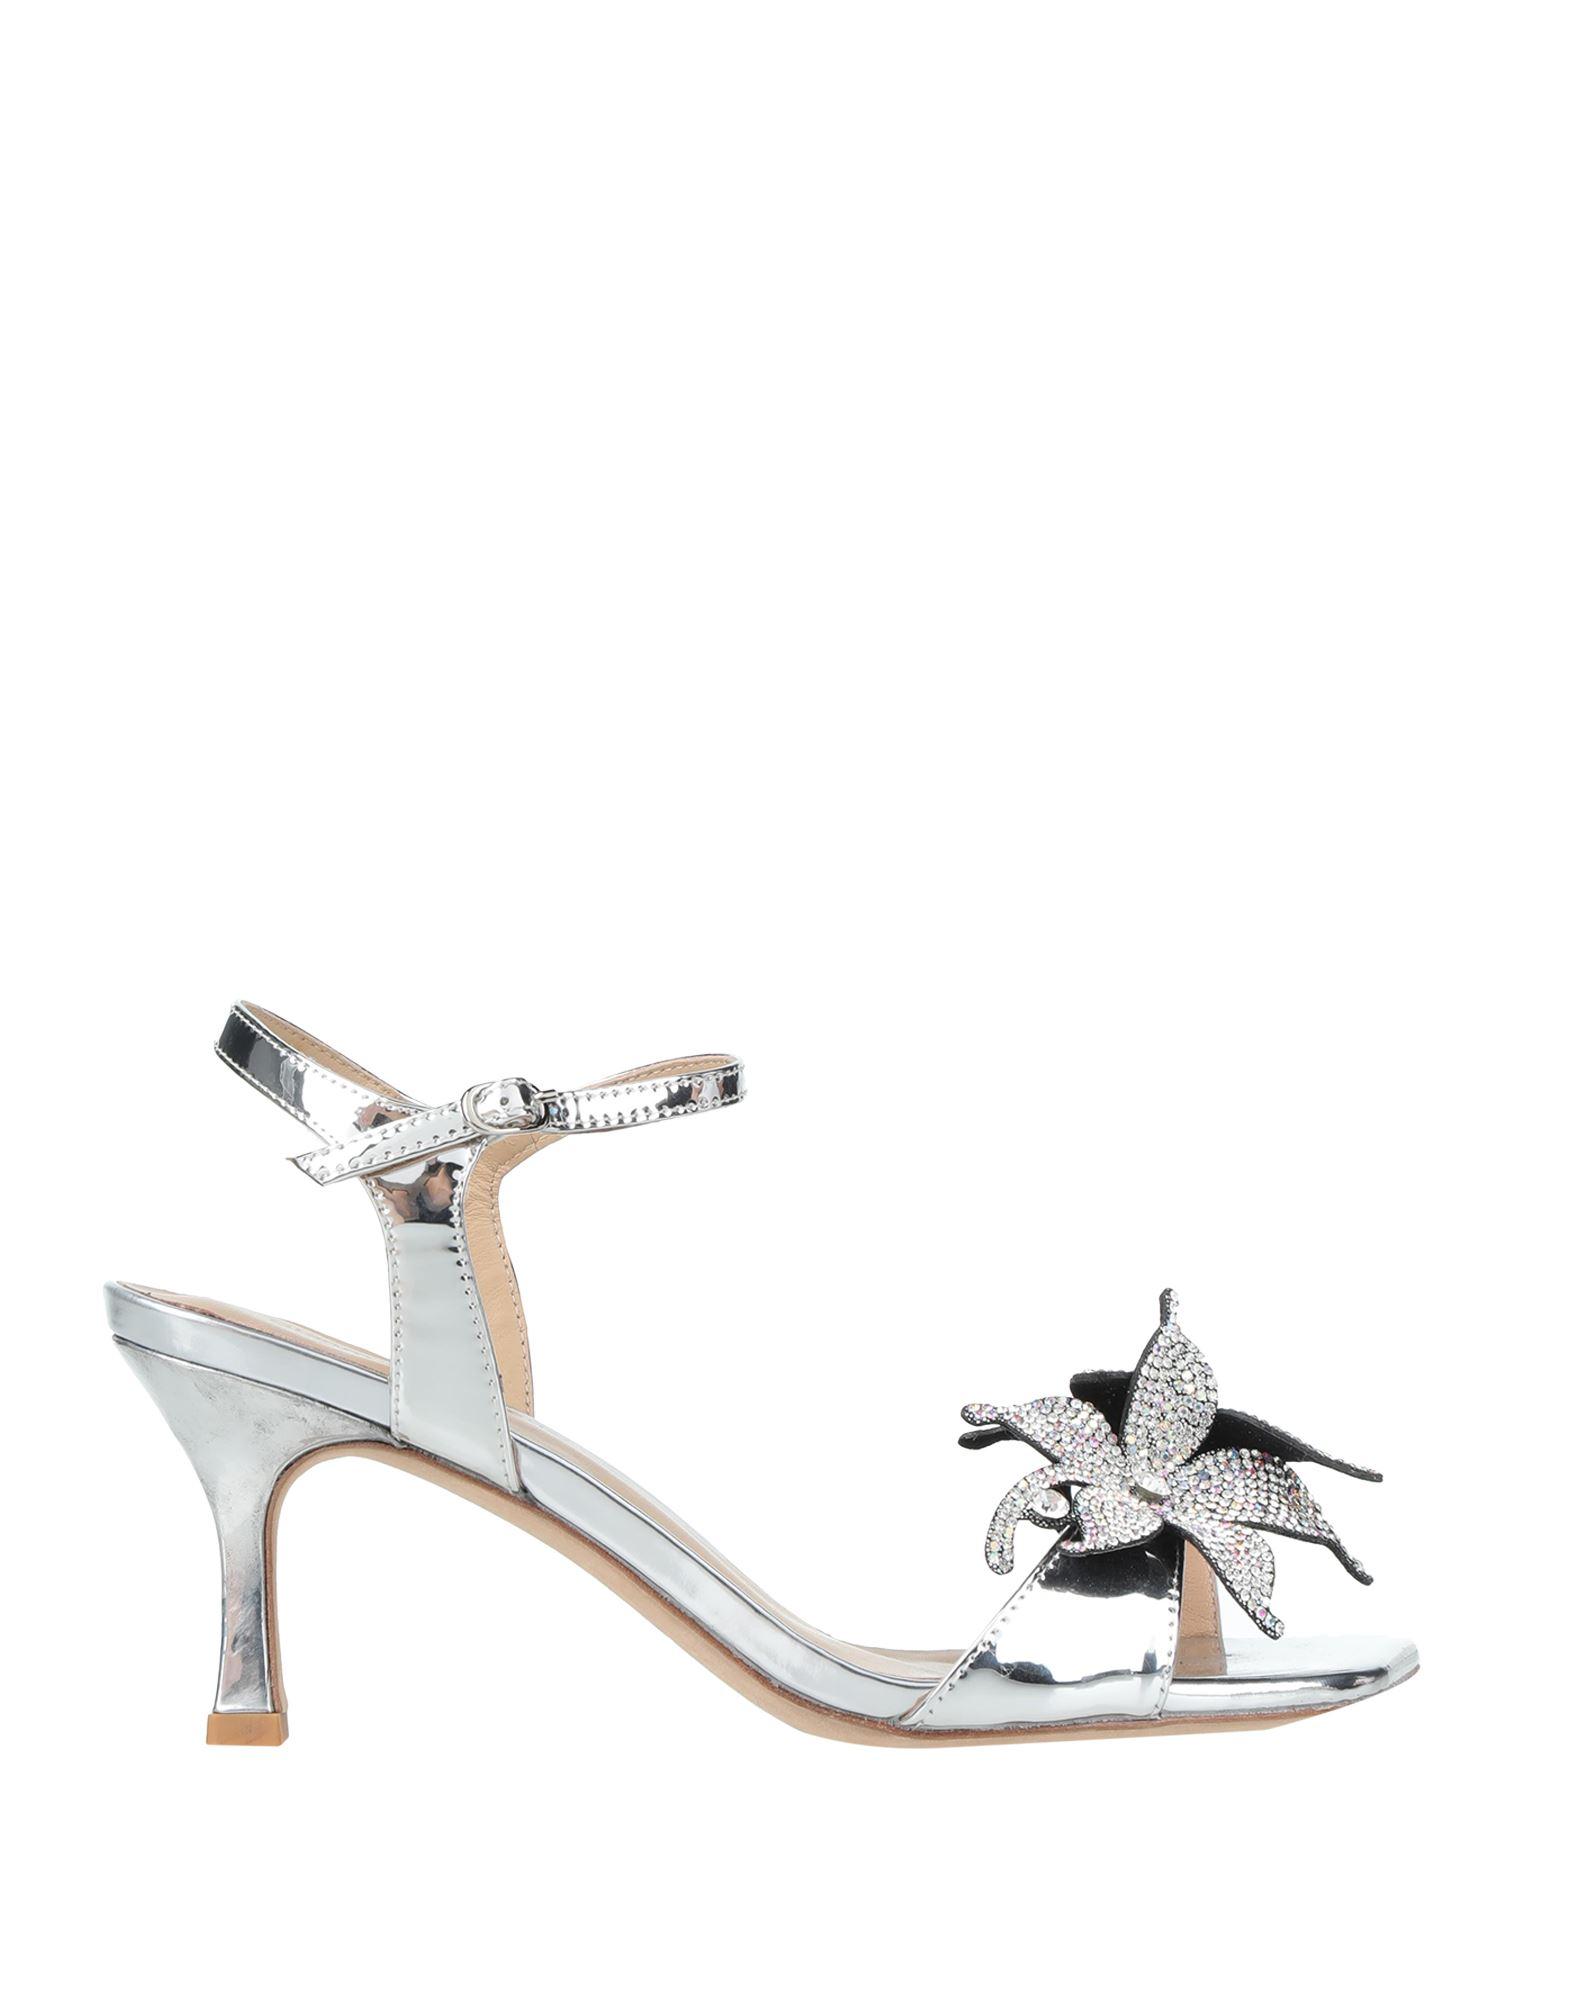 Gianmarco Lorenzi Sandals In Silver